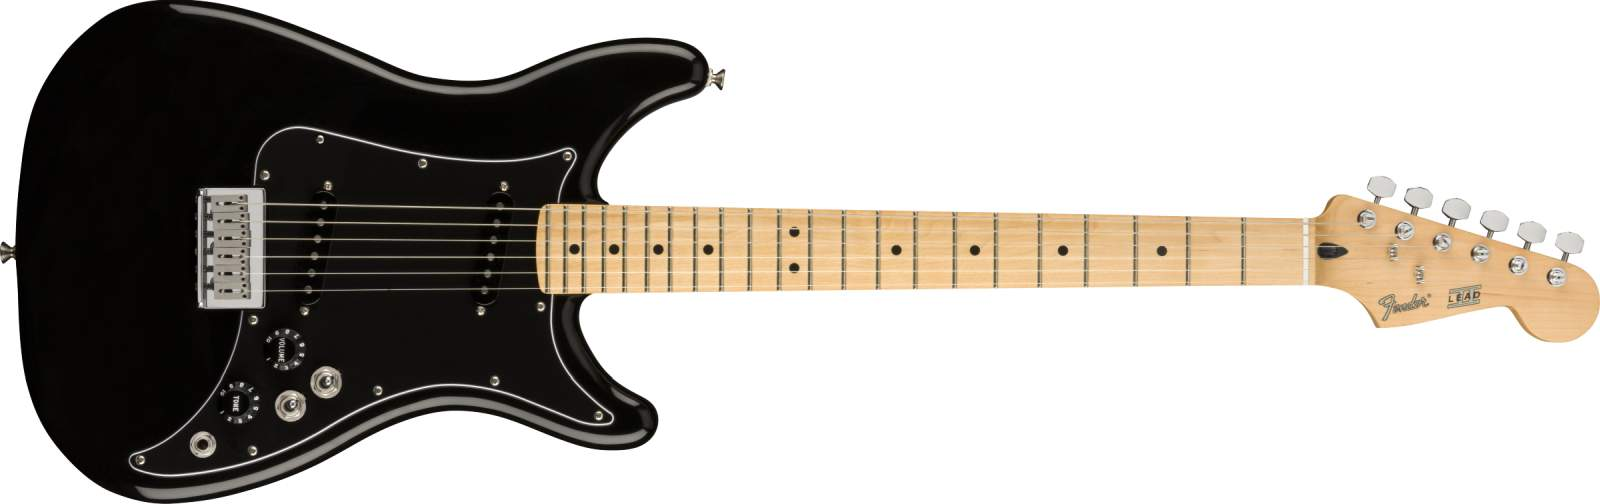 Fender Player Lead II MN Black